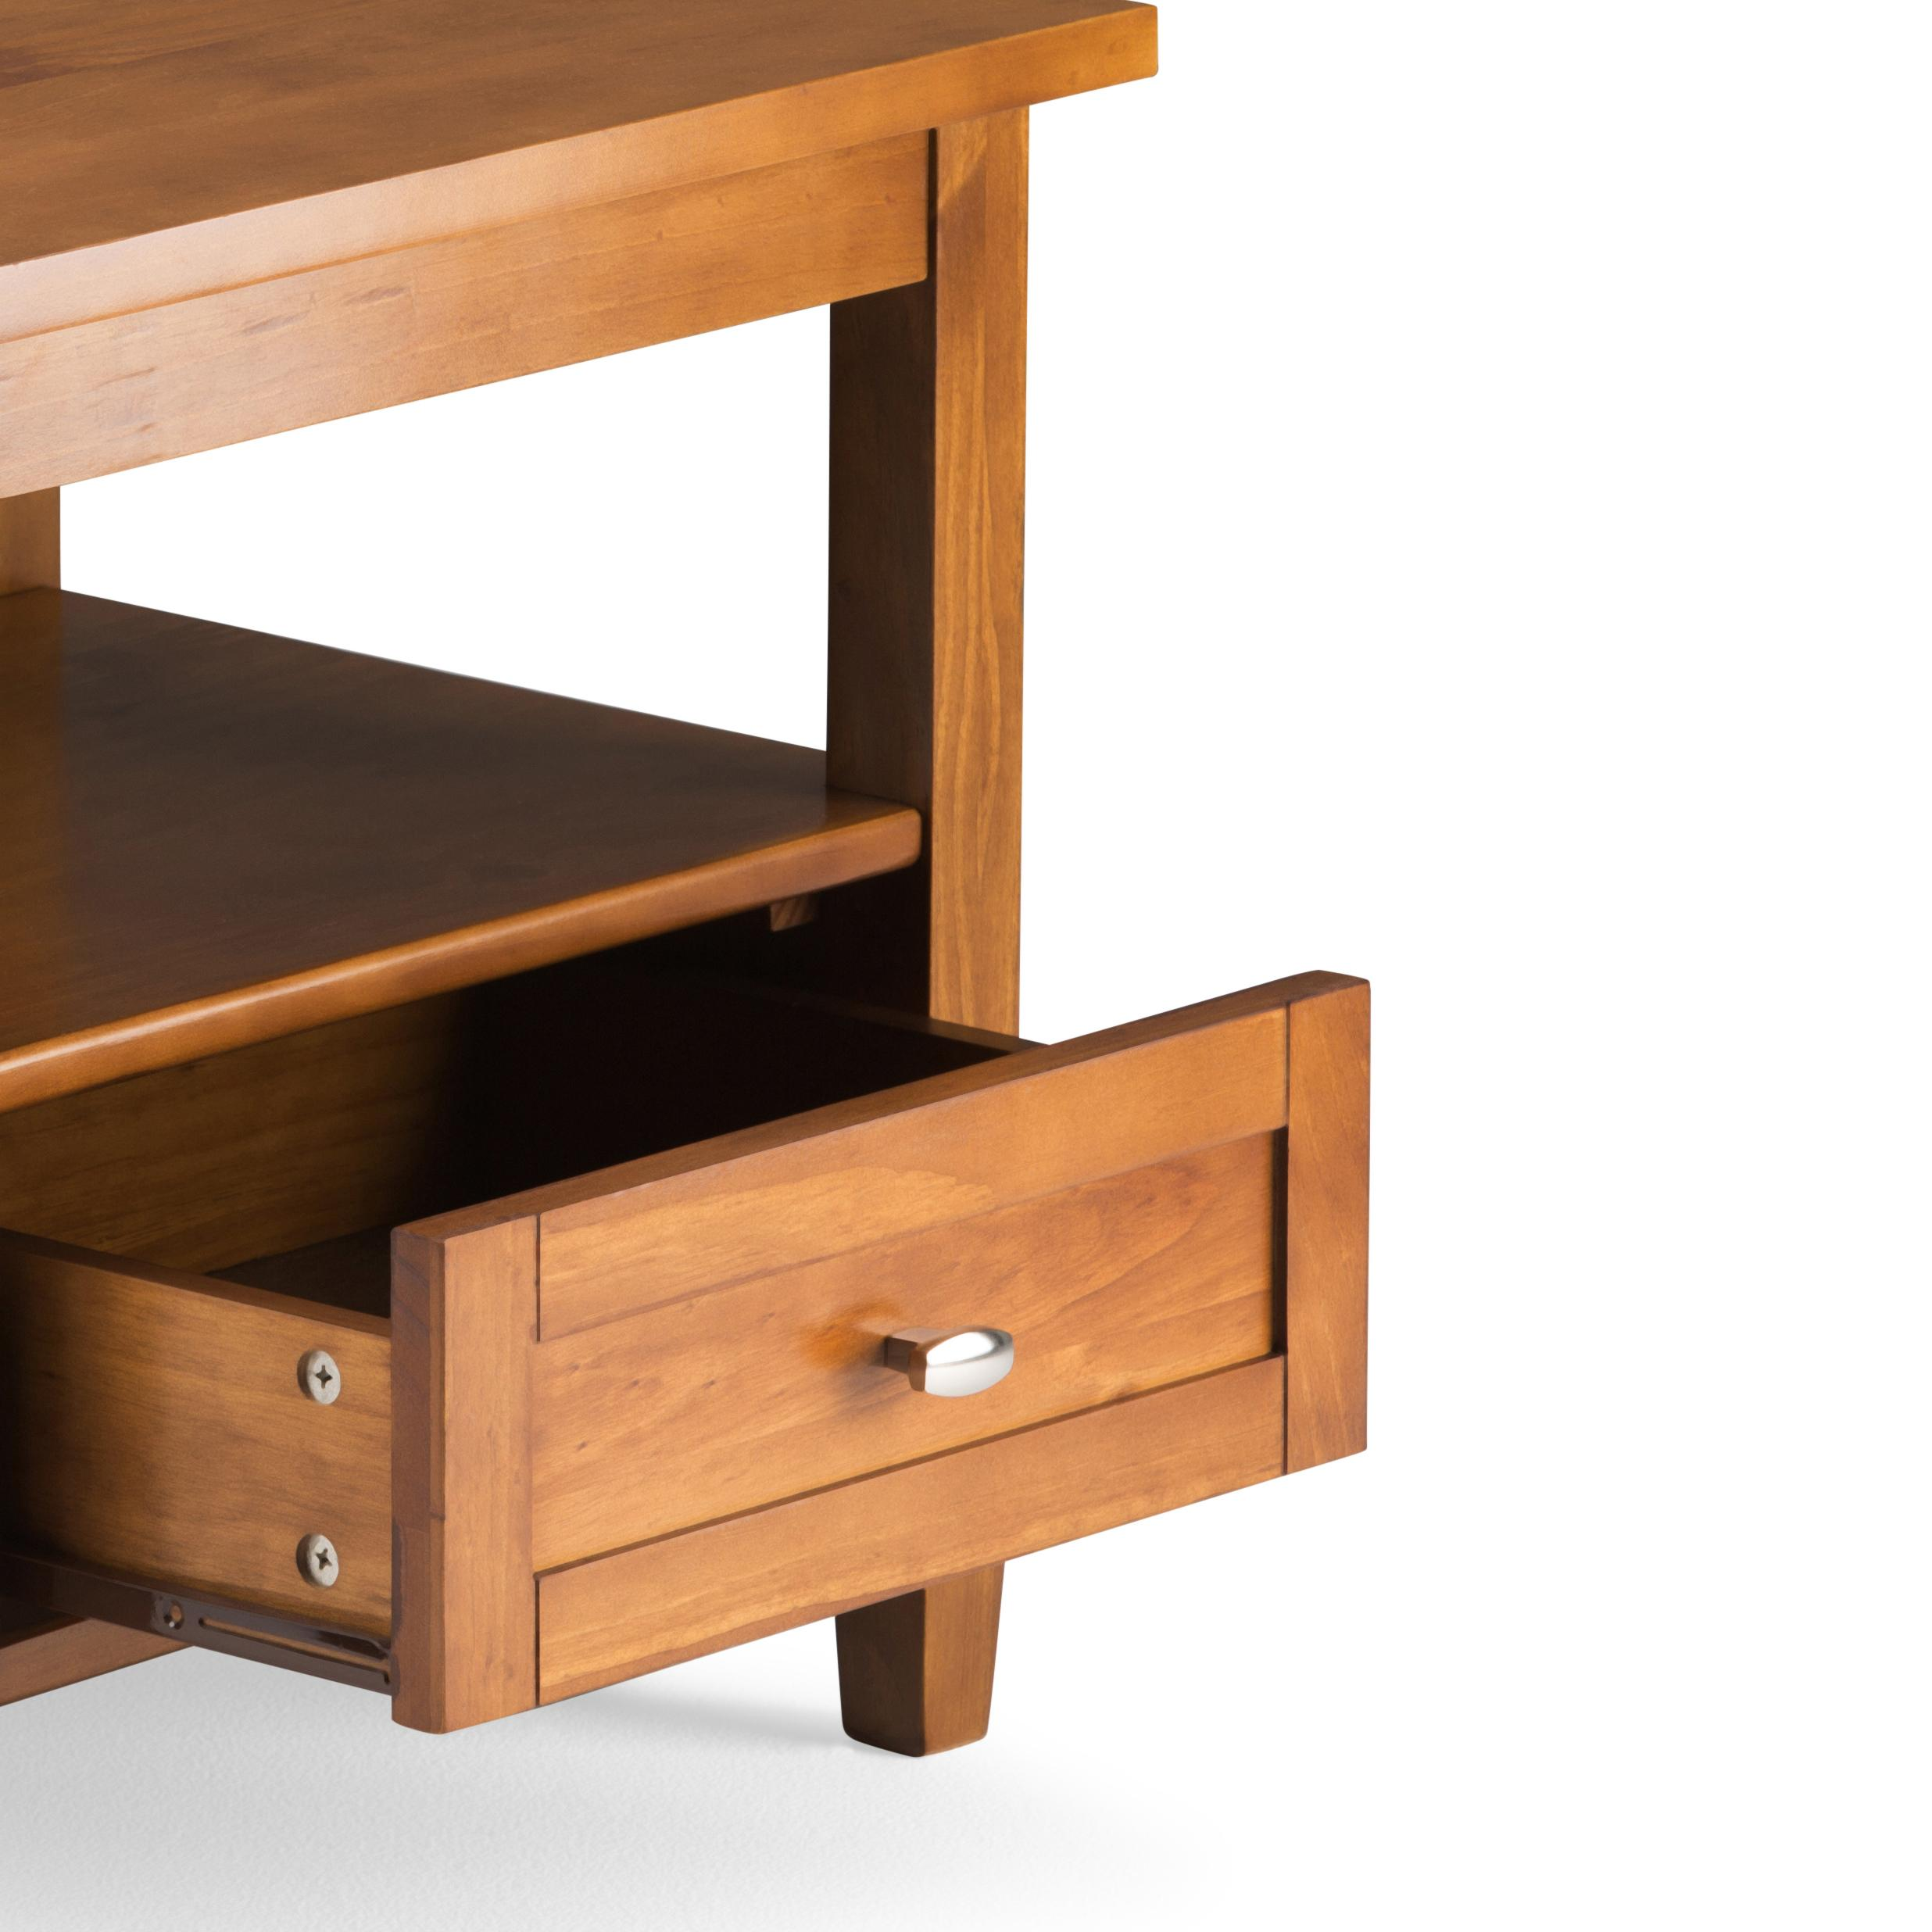 Amazon.com: Simpli Home AXWSH002 Warm Shaker Solid Wood 20